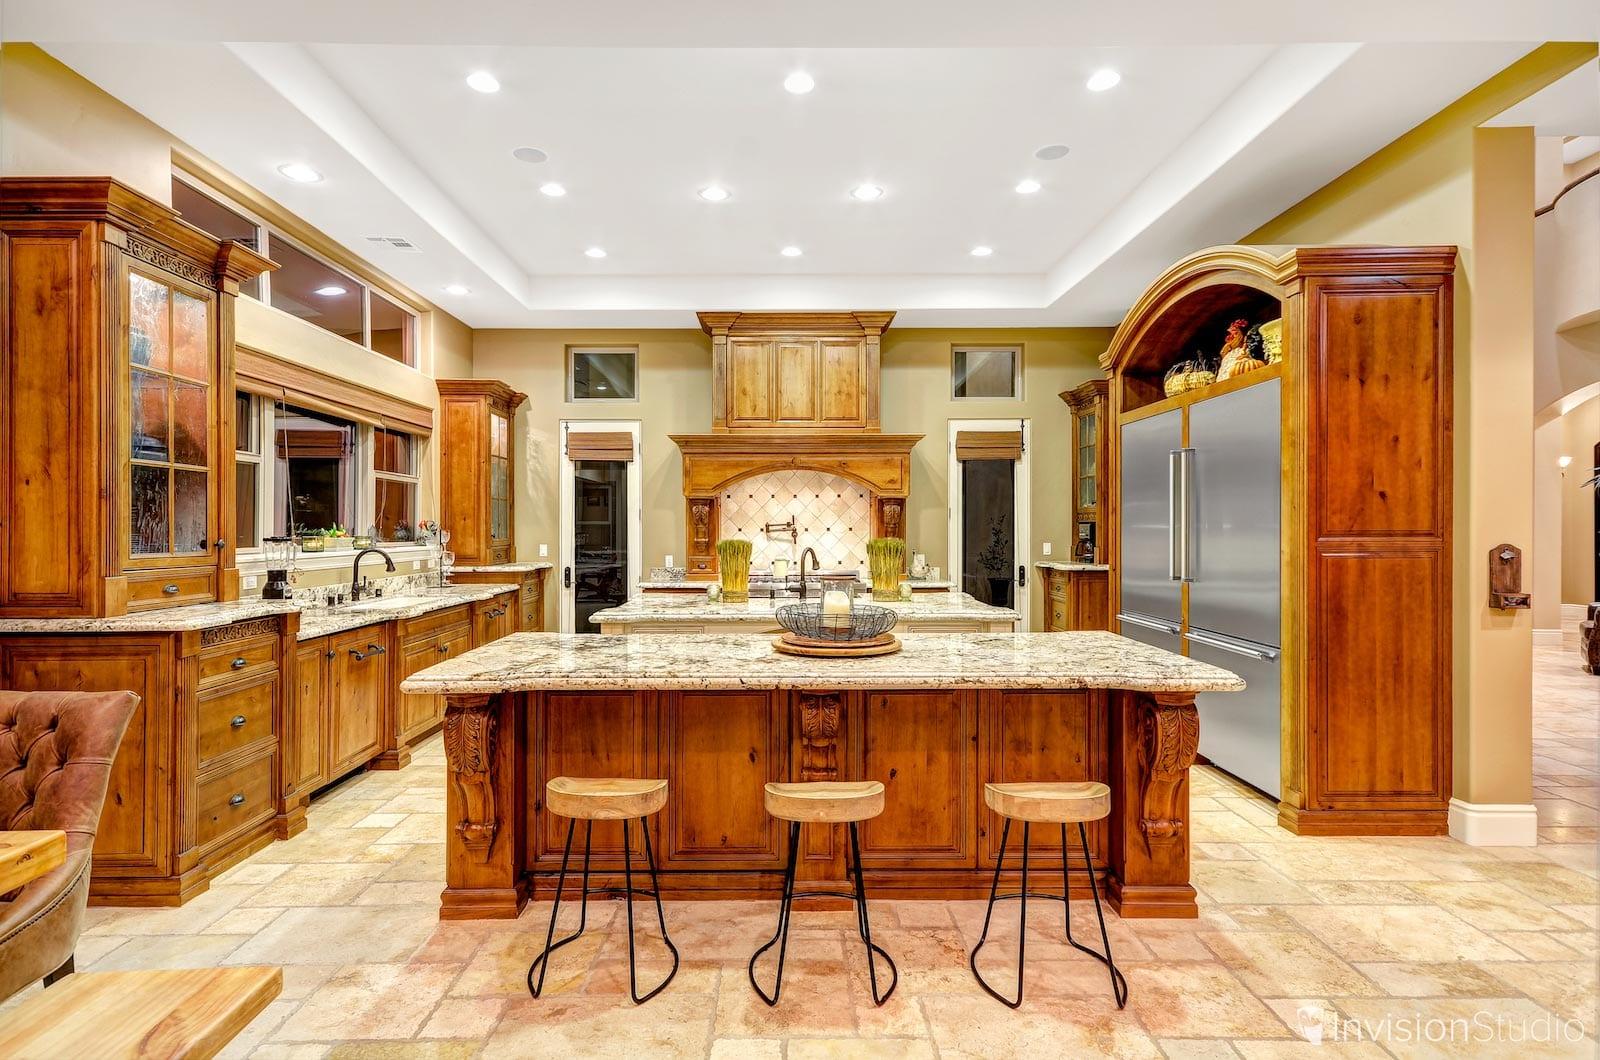 Cornado 360 Virtual Tours | Cornado Real Estate Aerial Photography Services | Cornado Property Photography Services | Cornado Matterport 3D Home Tours